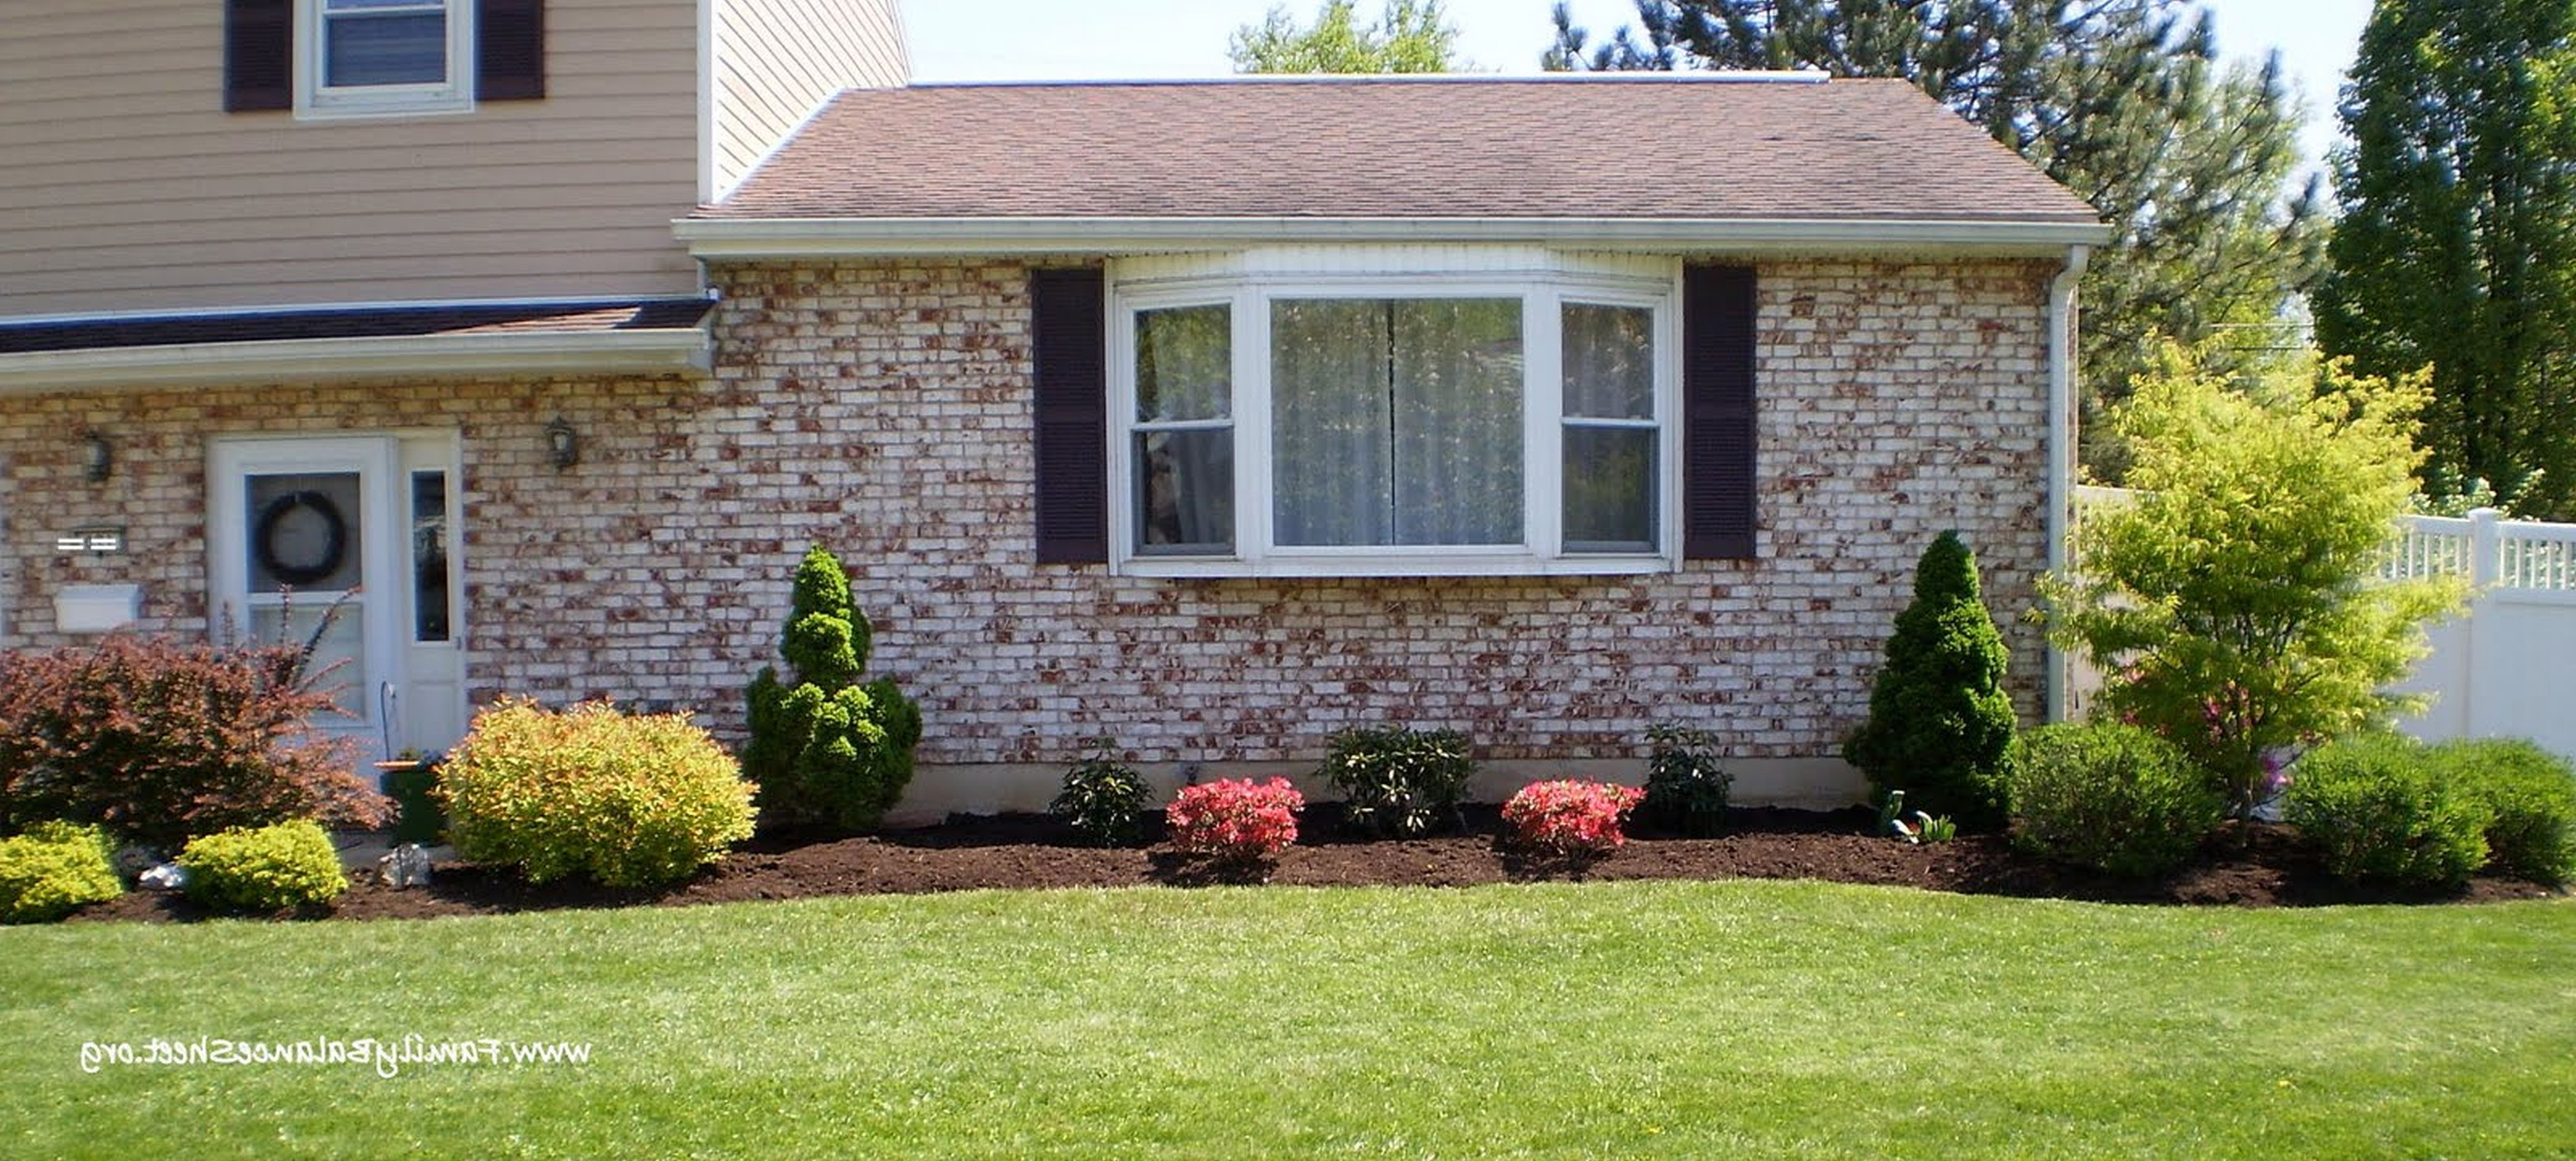 Garden design ideas front house | Hawk Haven on ranch style home landscape design, colonial home landscape design, victorian house landscape design,